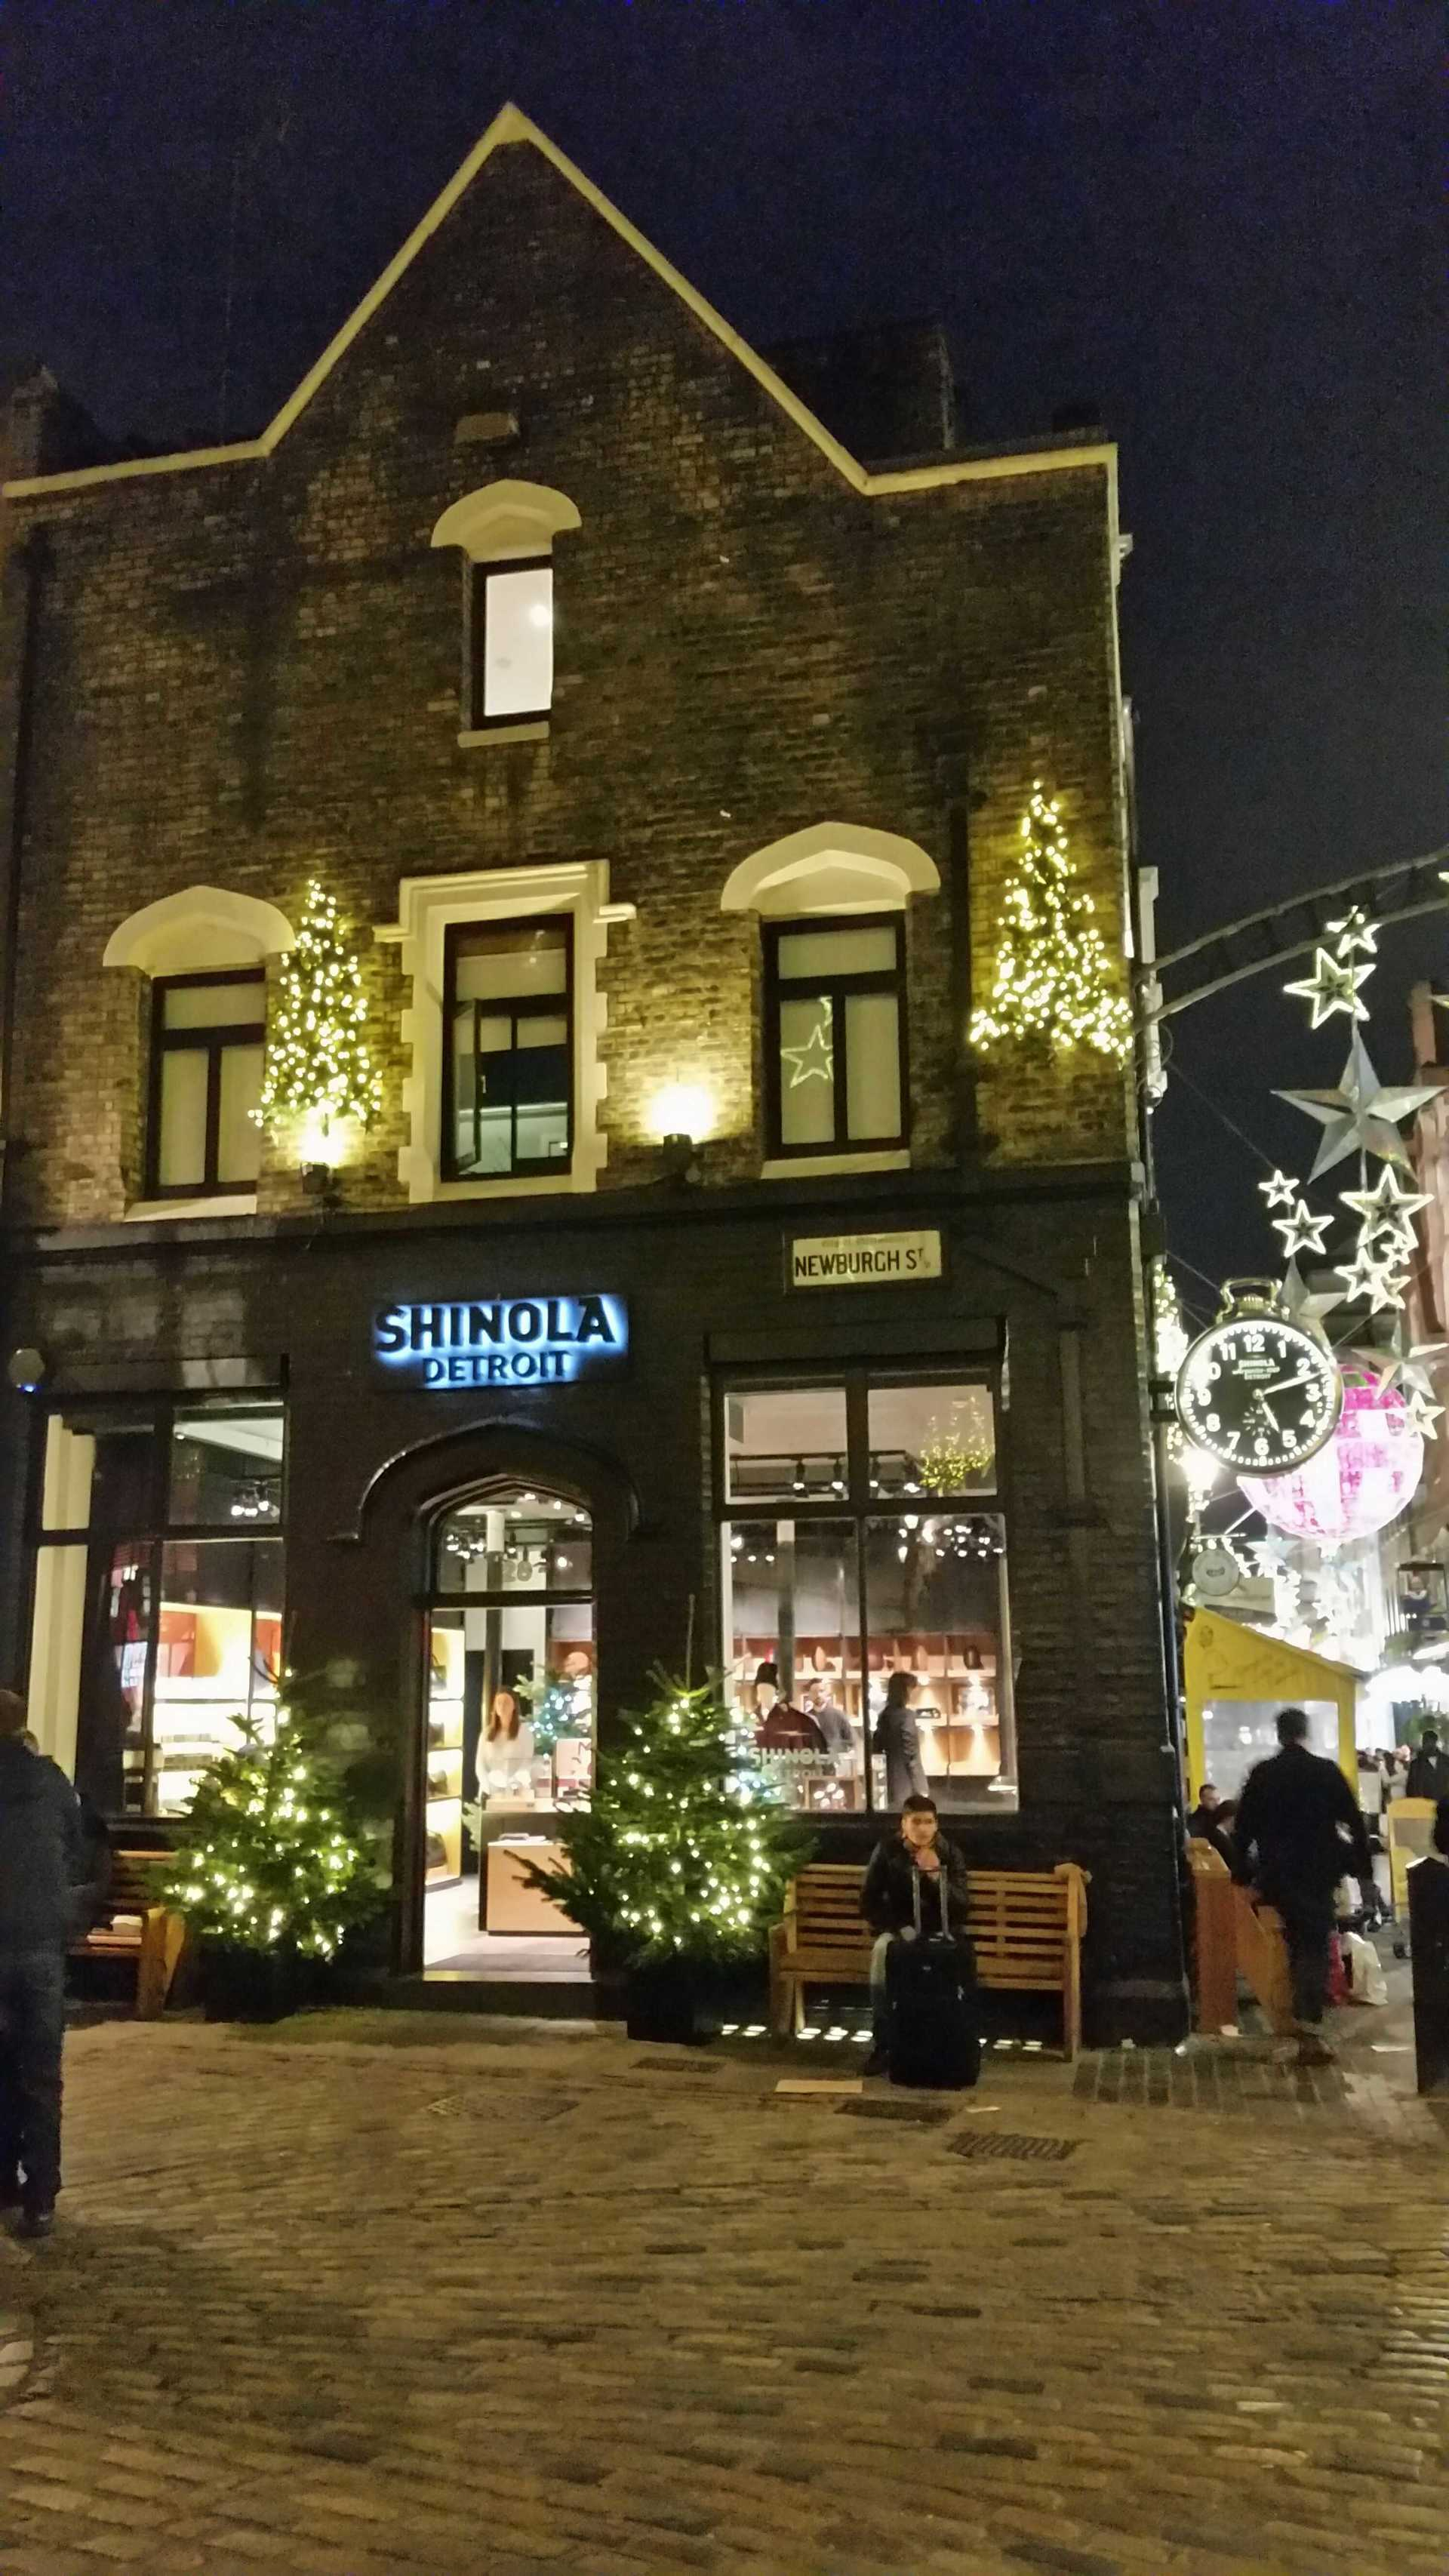 Shinola Store in London at Christmas